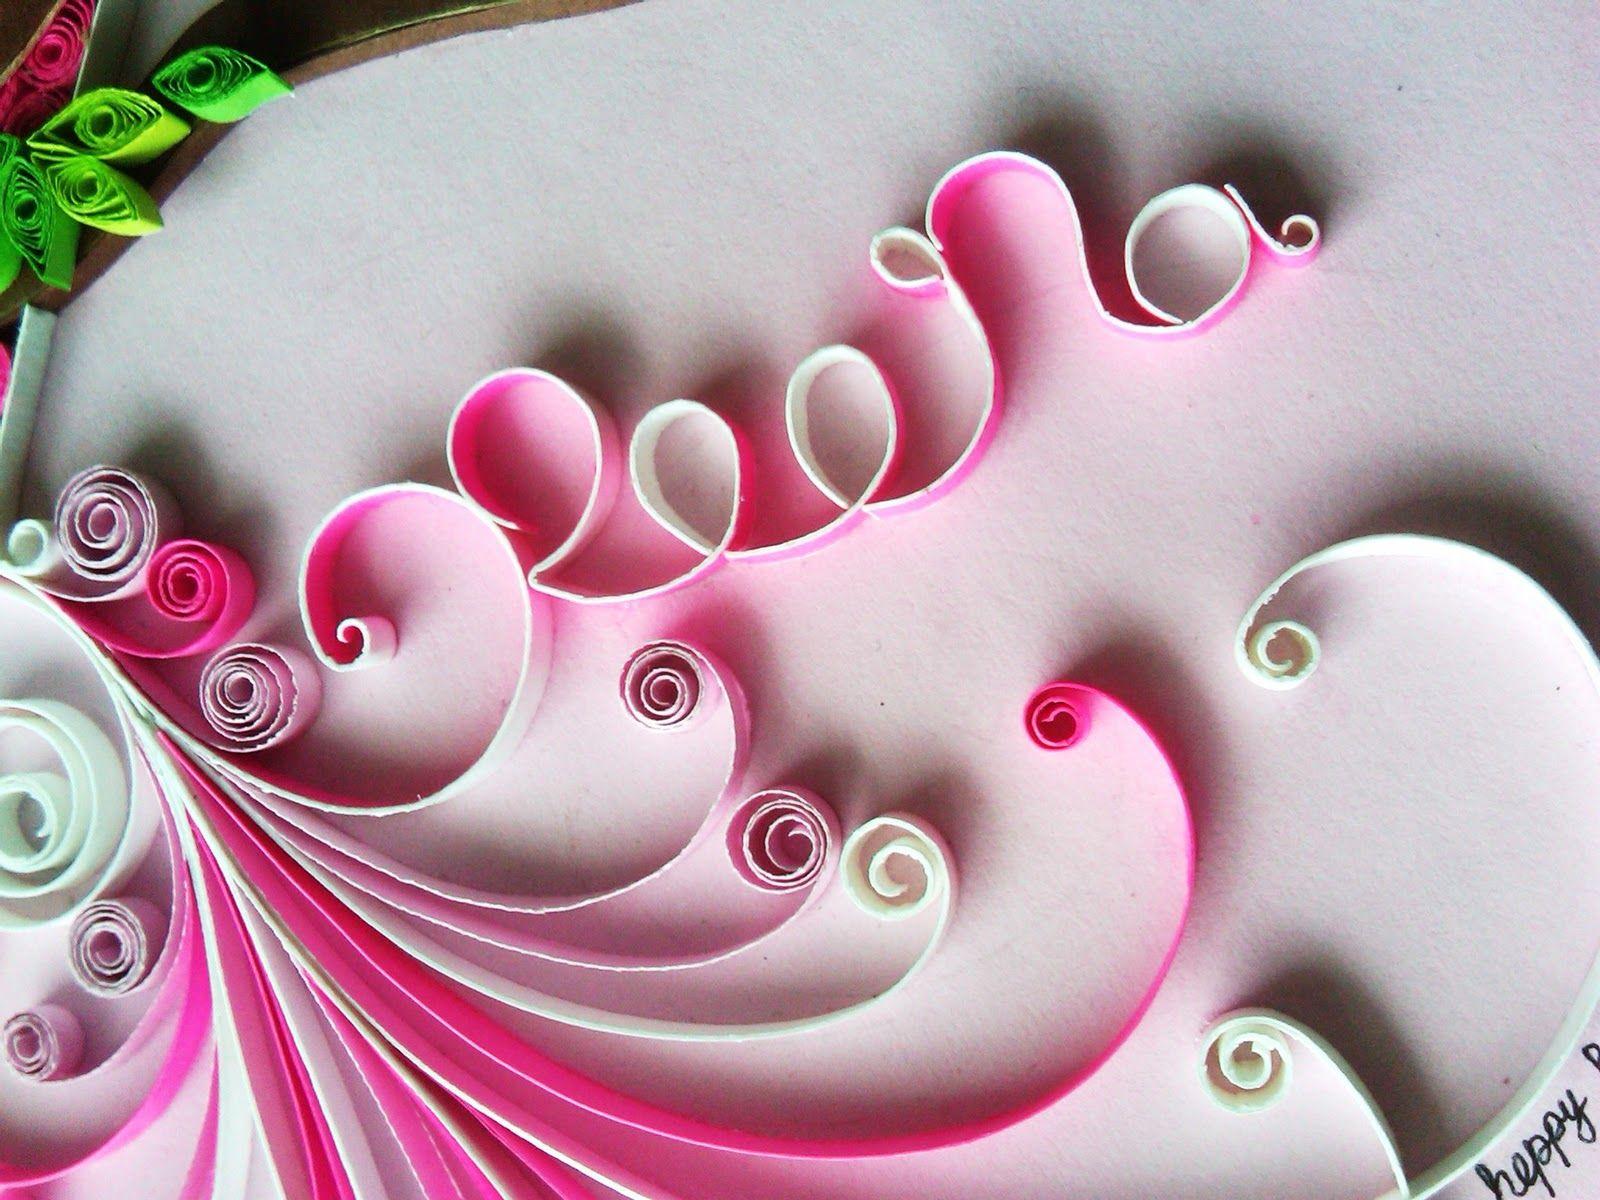 Most Inspiring Wallpaper Name Birthday - 066118f5f9f199b9871e8cae5174ee8e  Pic_402979.jpg